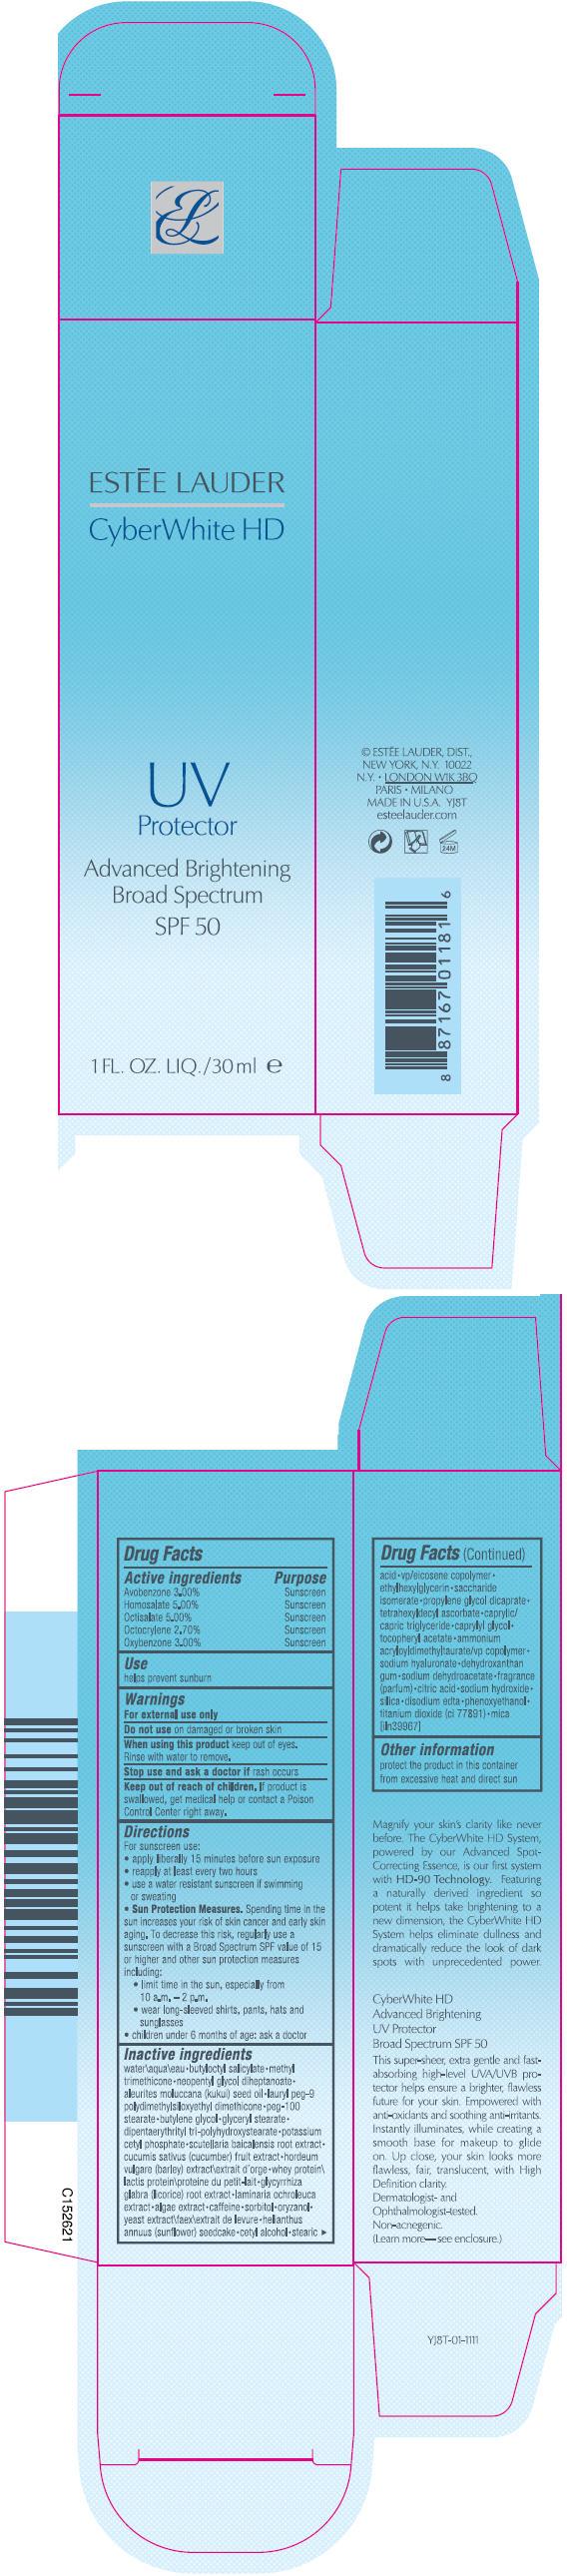 Cyberwhite Hd Uv Protector Broad Spectrum Spf 50 (Avobenzone, Homosalate, Octisalate, Octocrylene, And Oxybenzone) Lotion [Estee Lauder Inc]